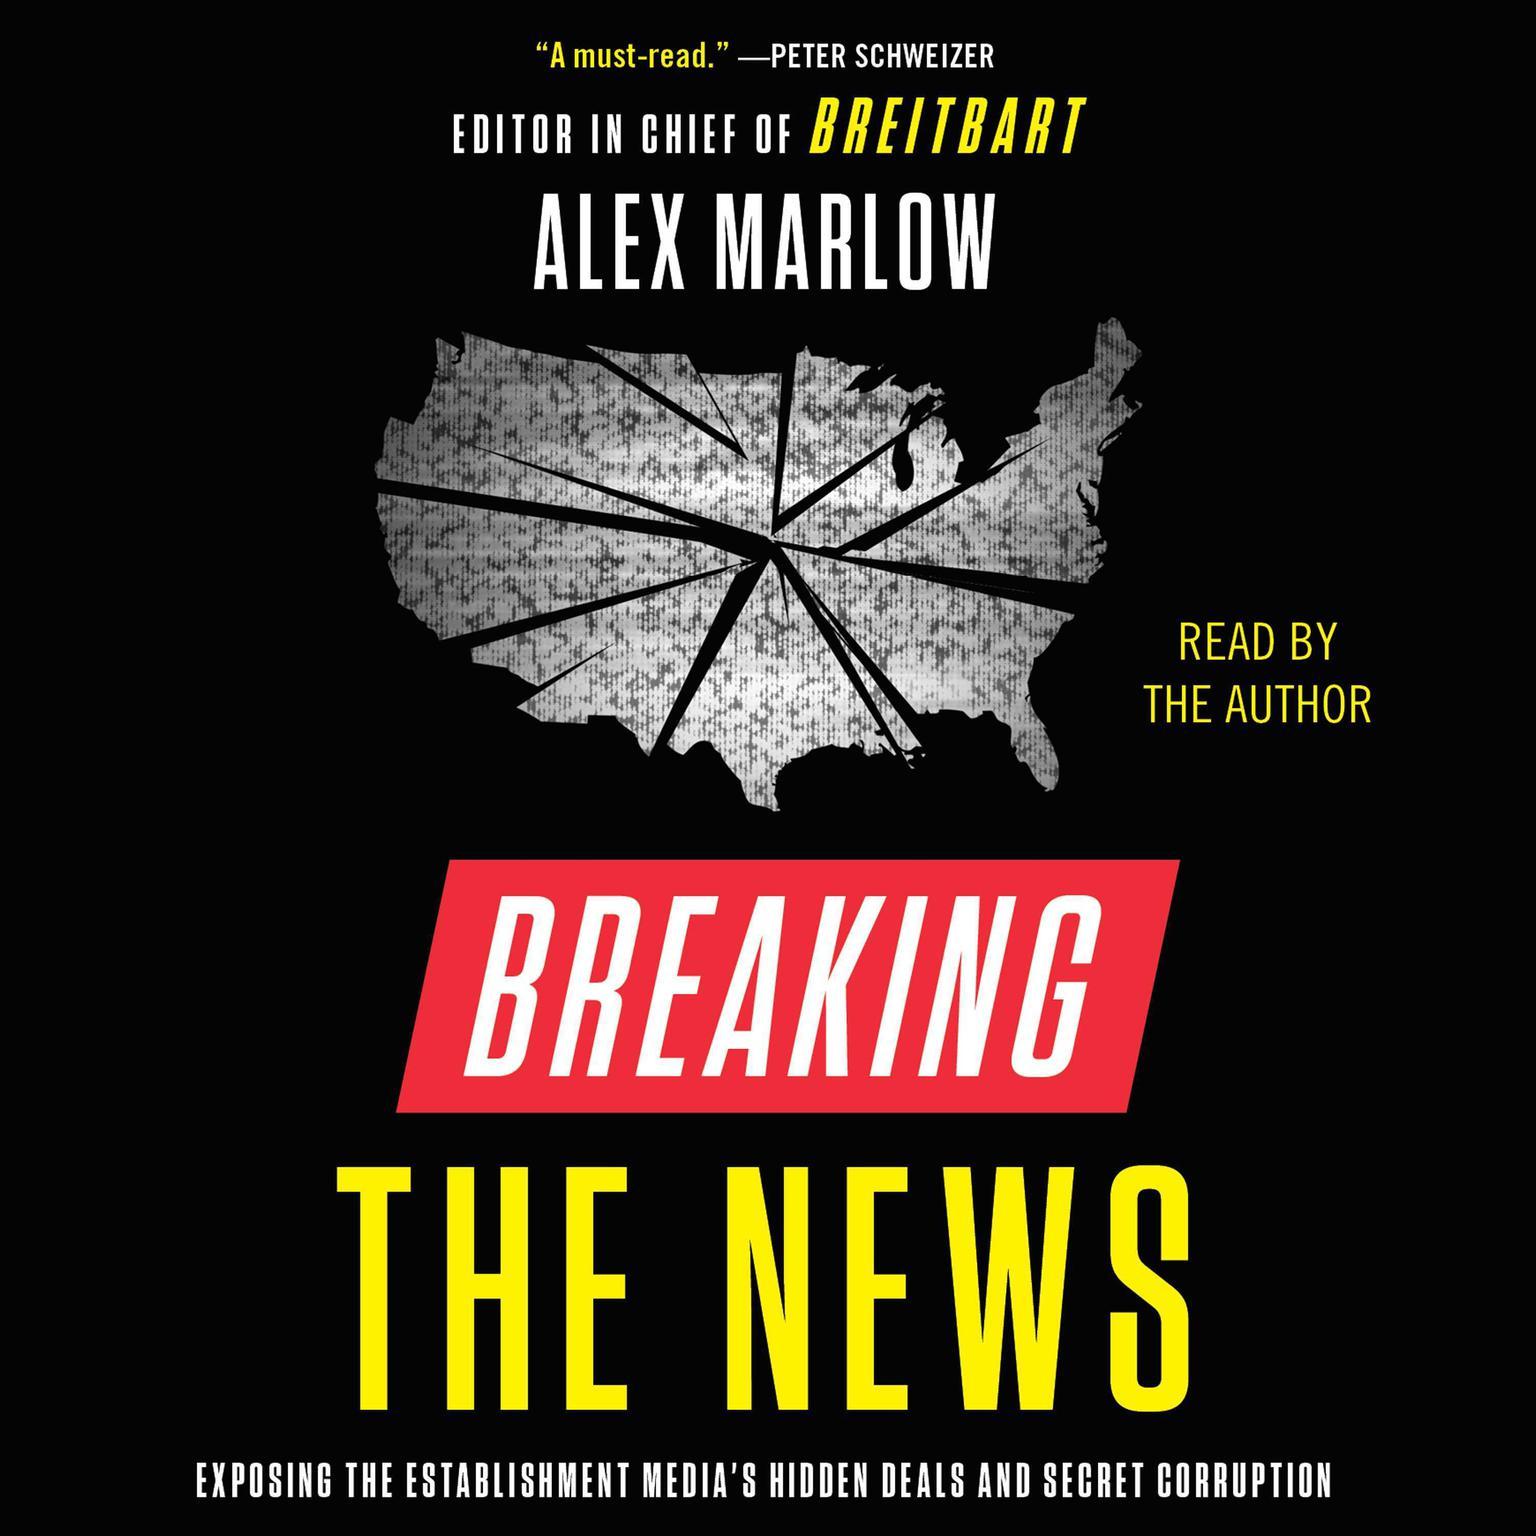 Breaking the News: Exposing the Establishment Medias Hidden Deals and Secret Corruption Audiobook, by Alex Marlow